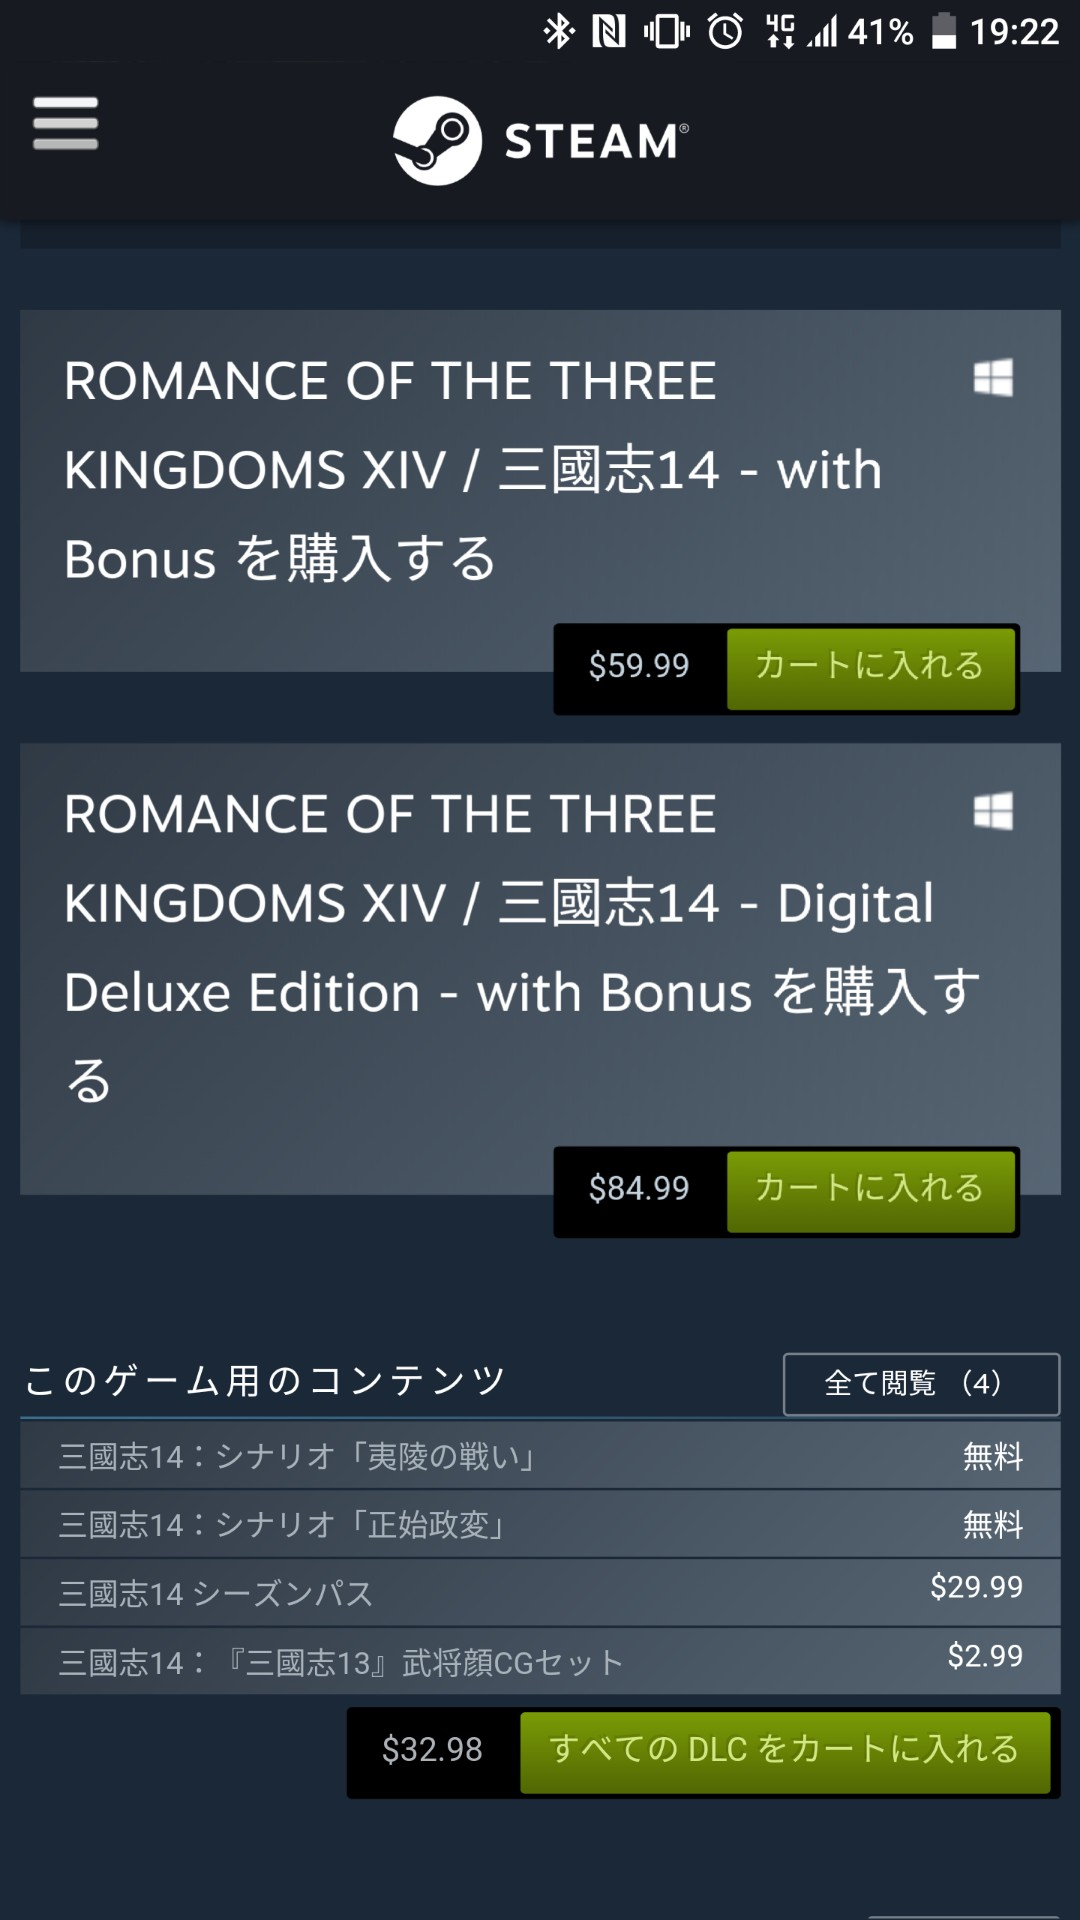 aHHmF8j - 【悲報】コエテクさん、外国で60ドルで販売するゲームを日本では特別価格で11000円で販売してしまう